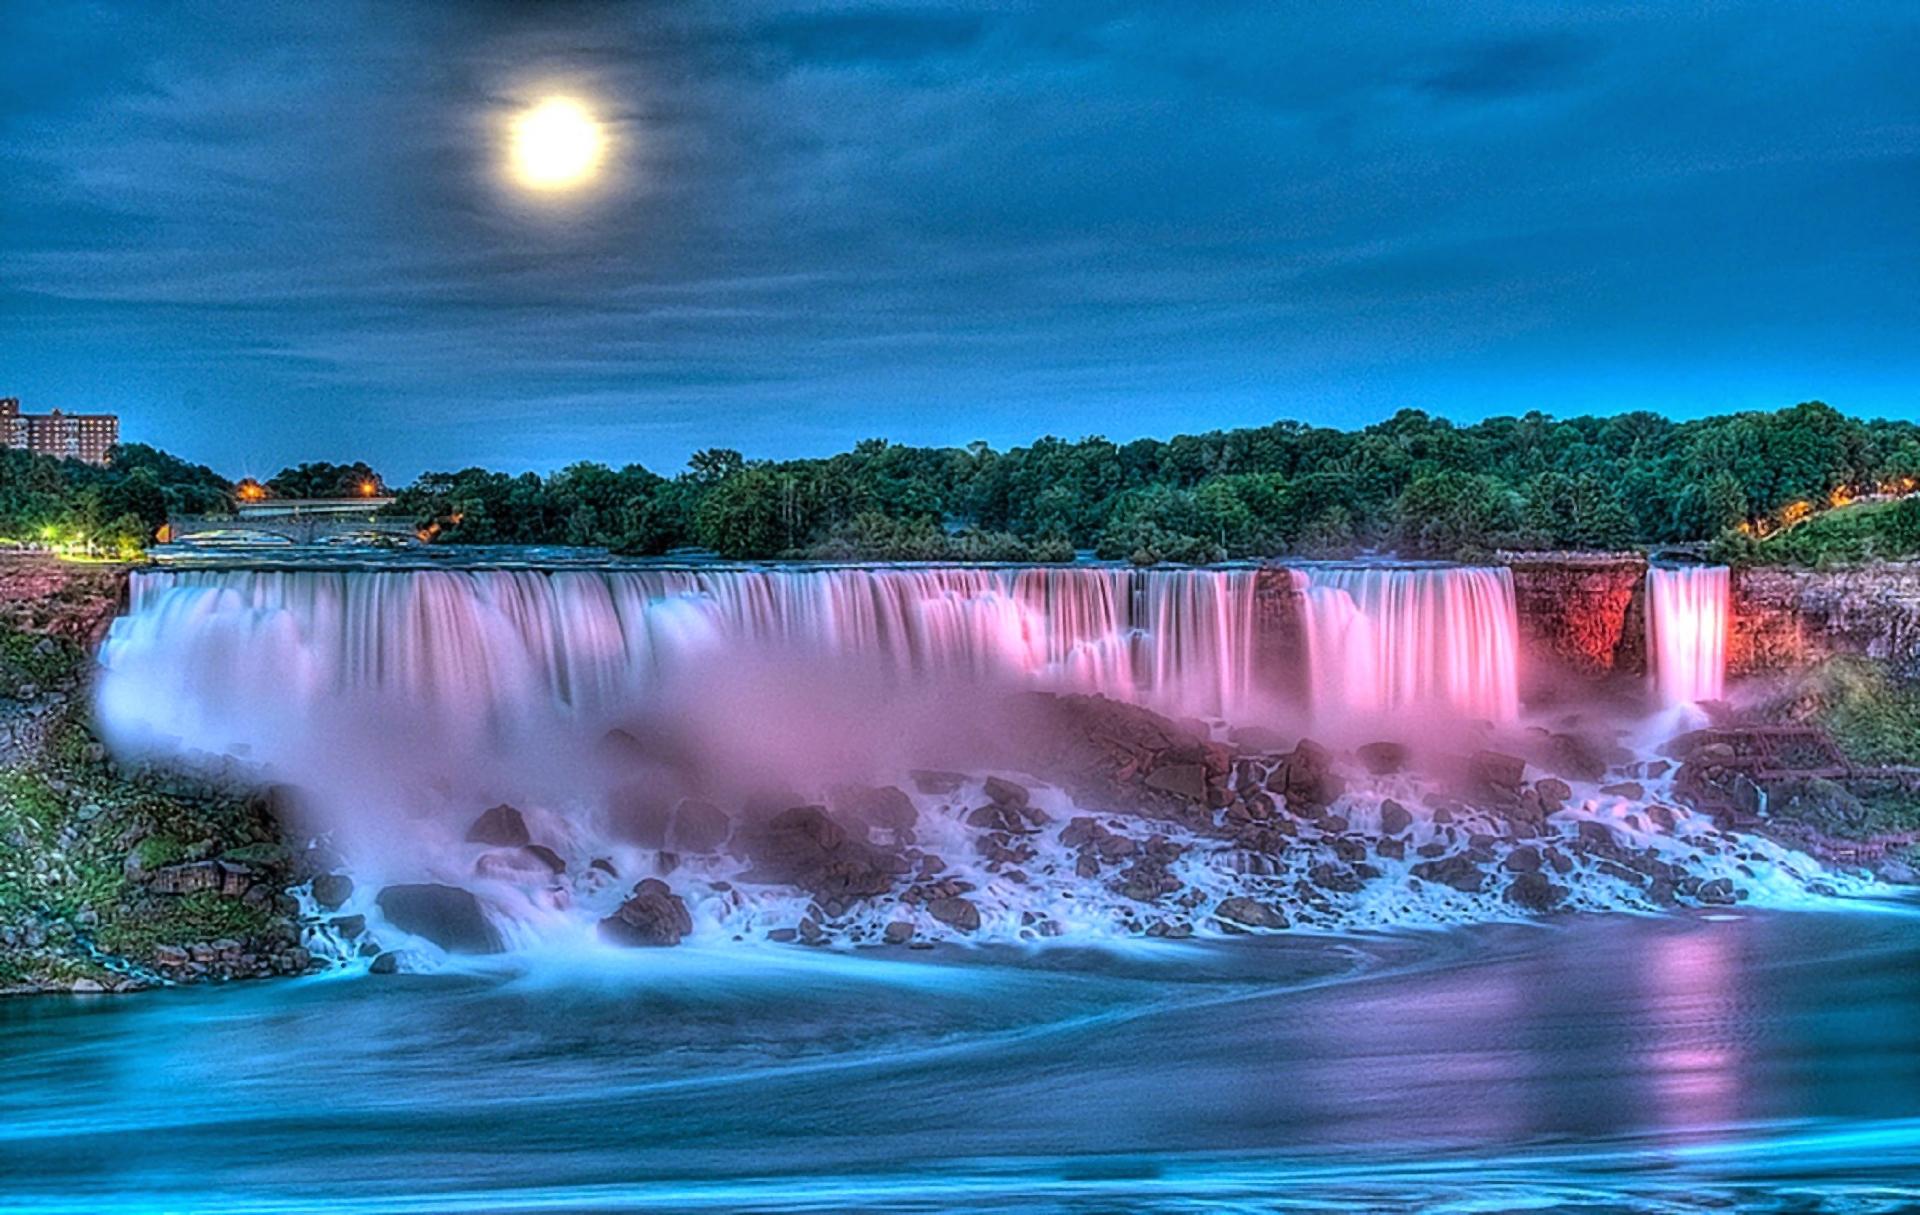 Niagara Water Falls Desktop Wallpaper Waterfall On Full Moon Night Full Hd Wallpaper And